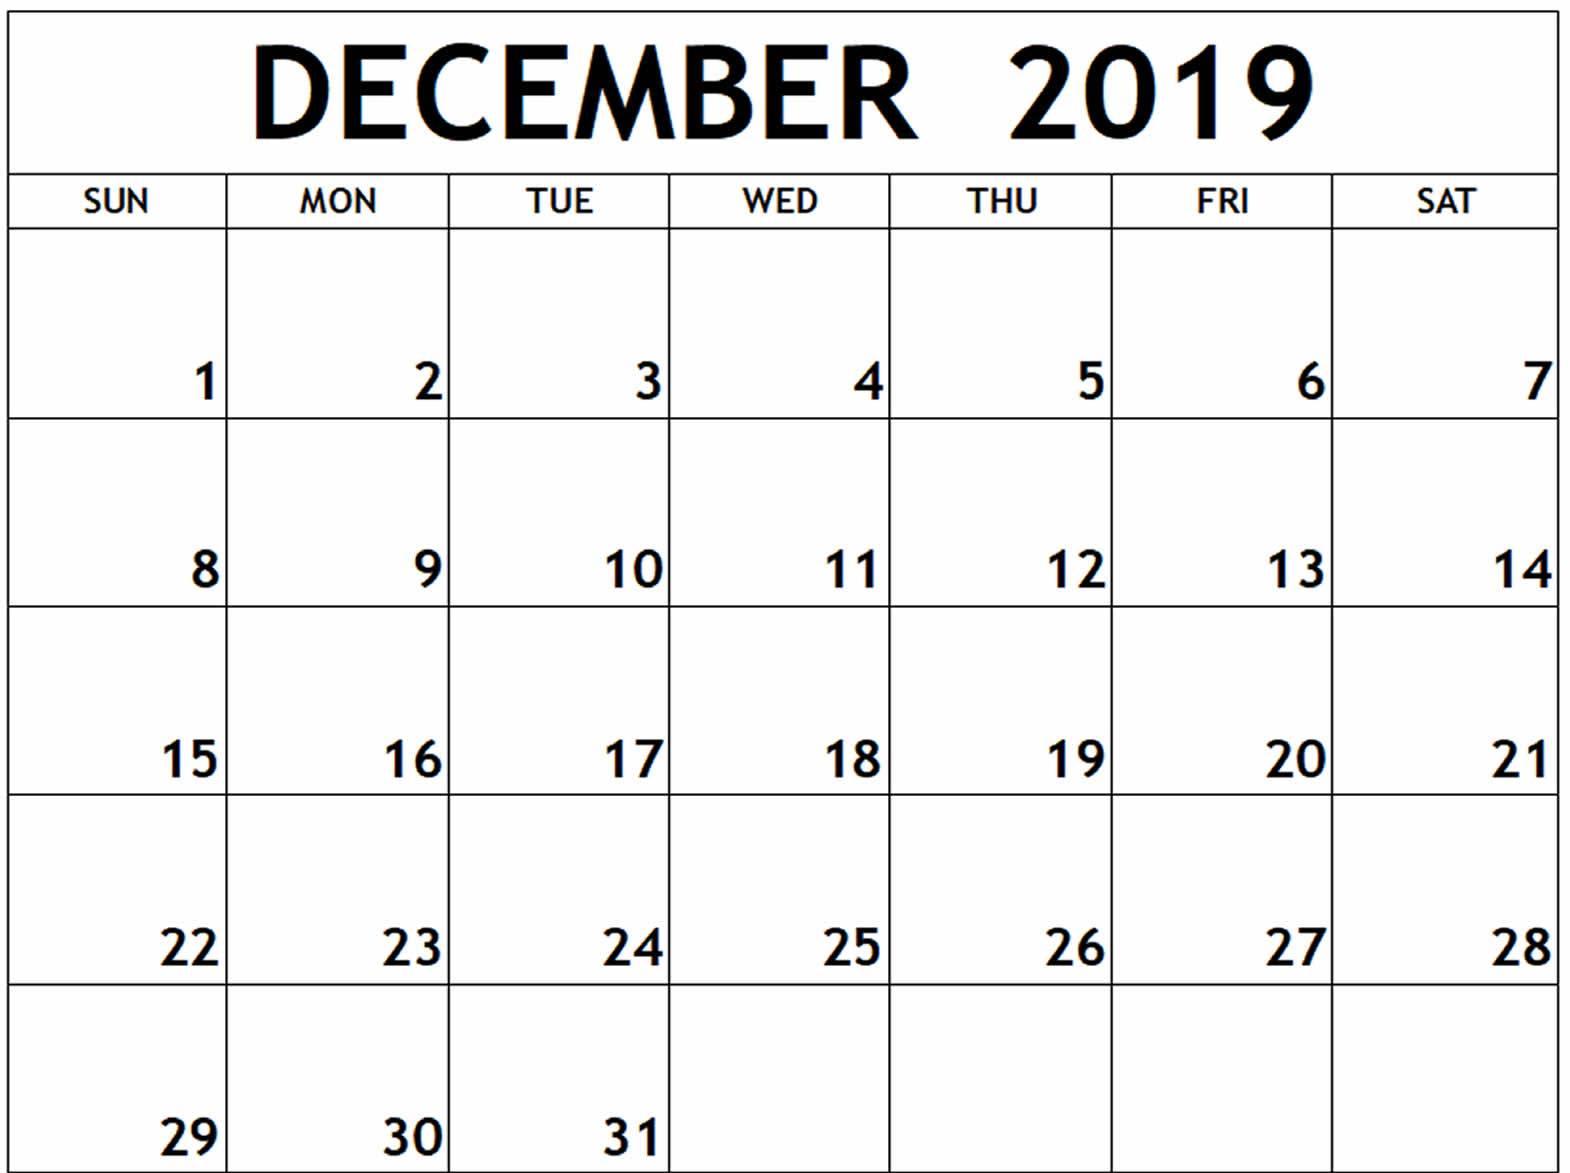 December Calendar 2019 Excel